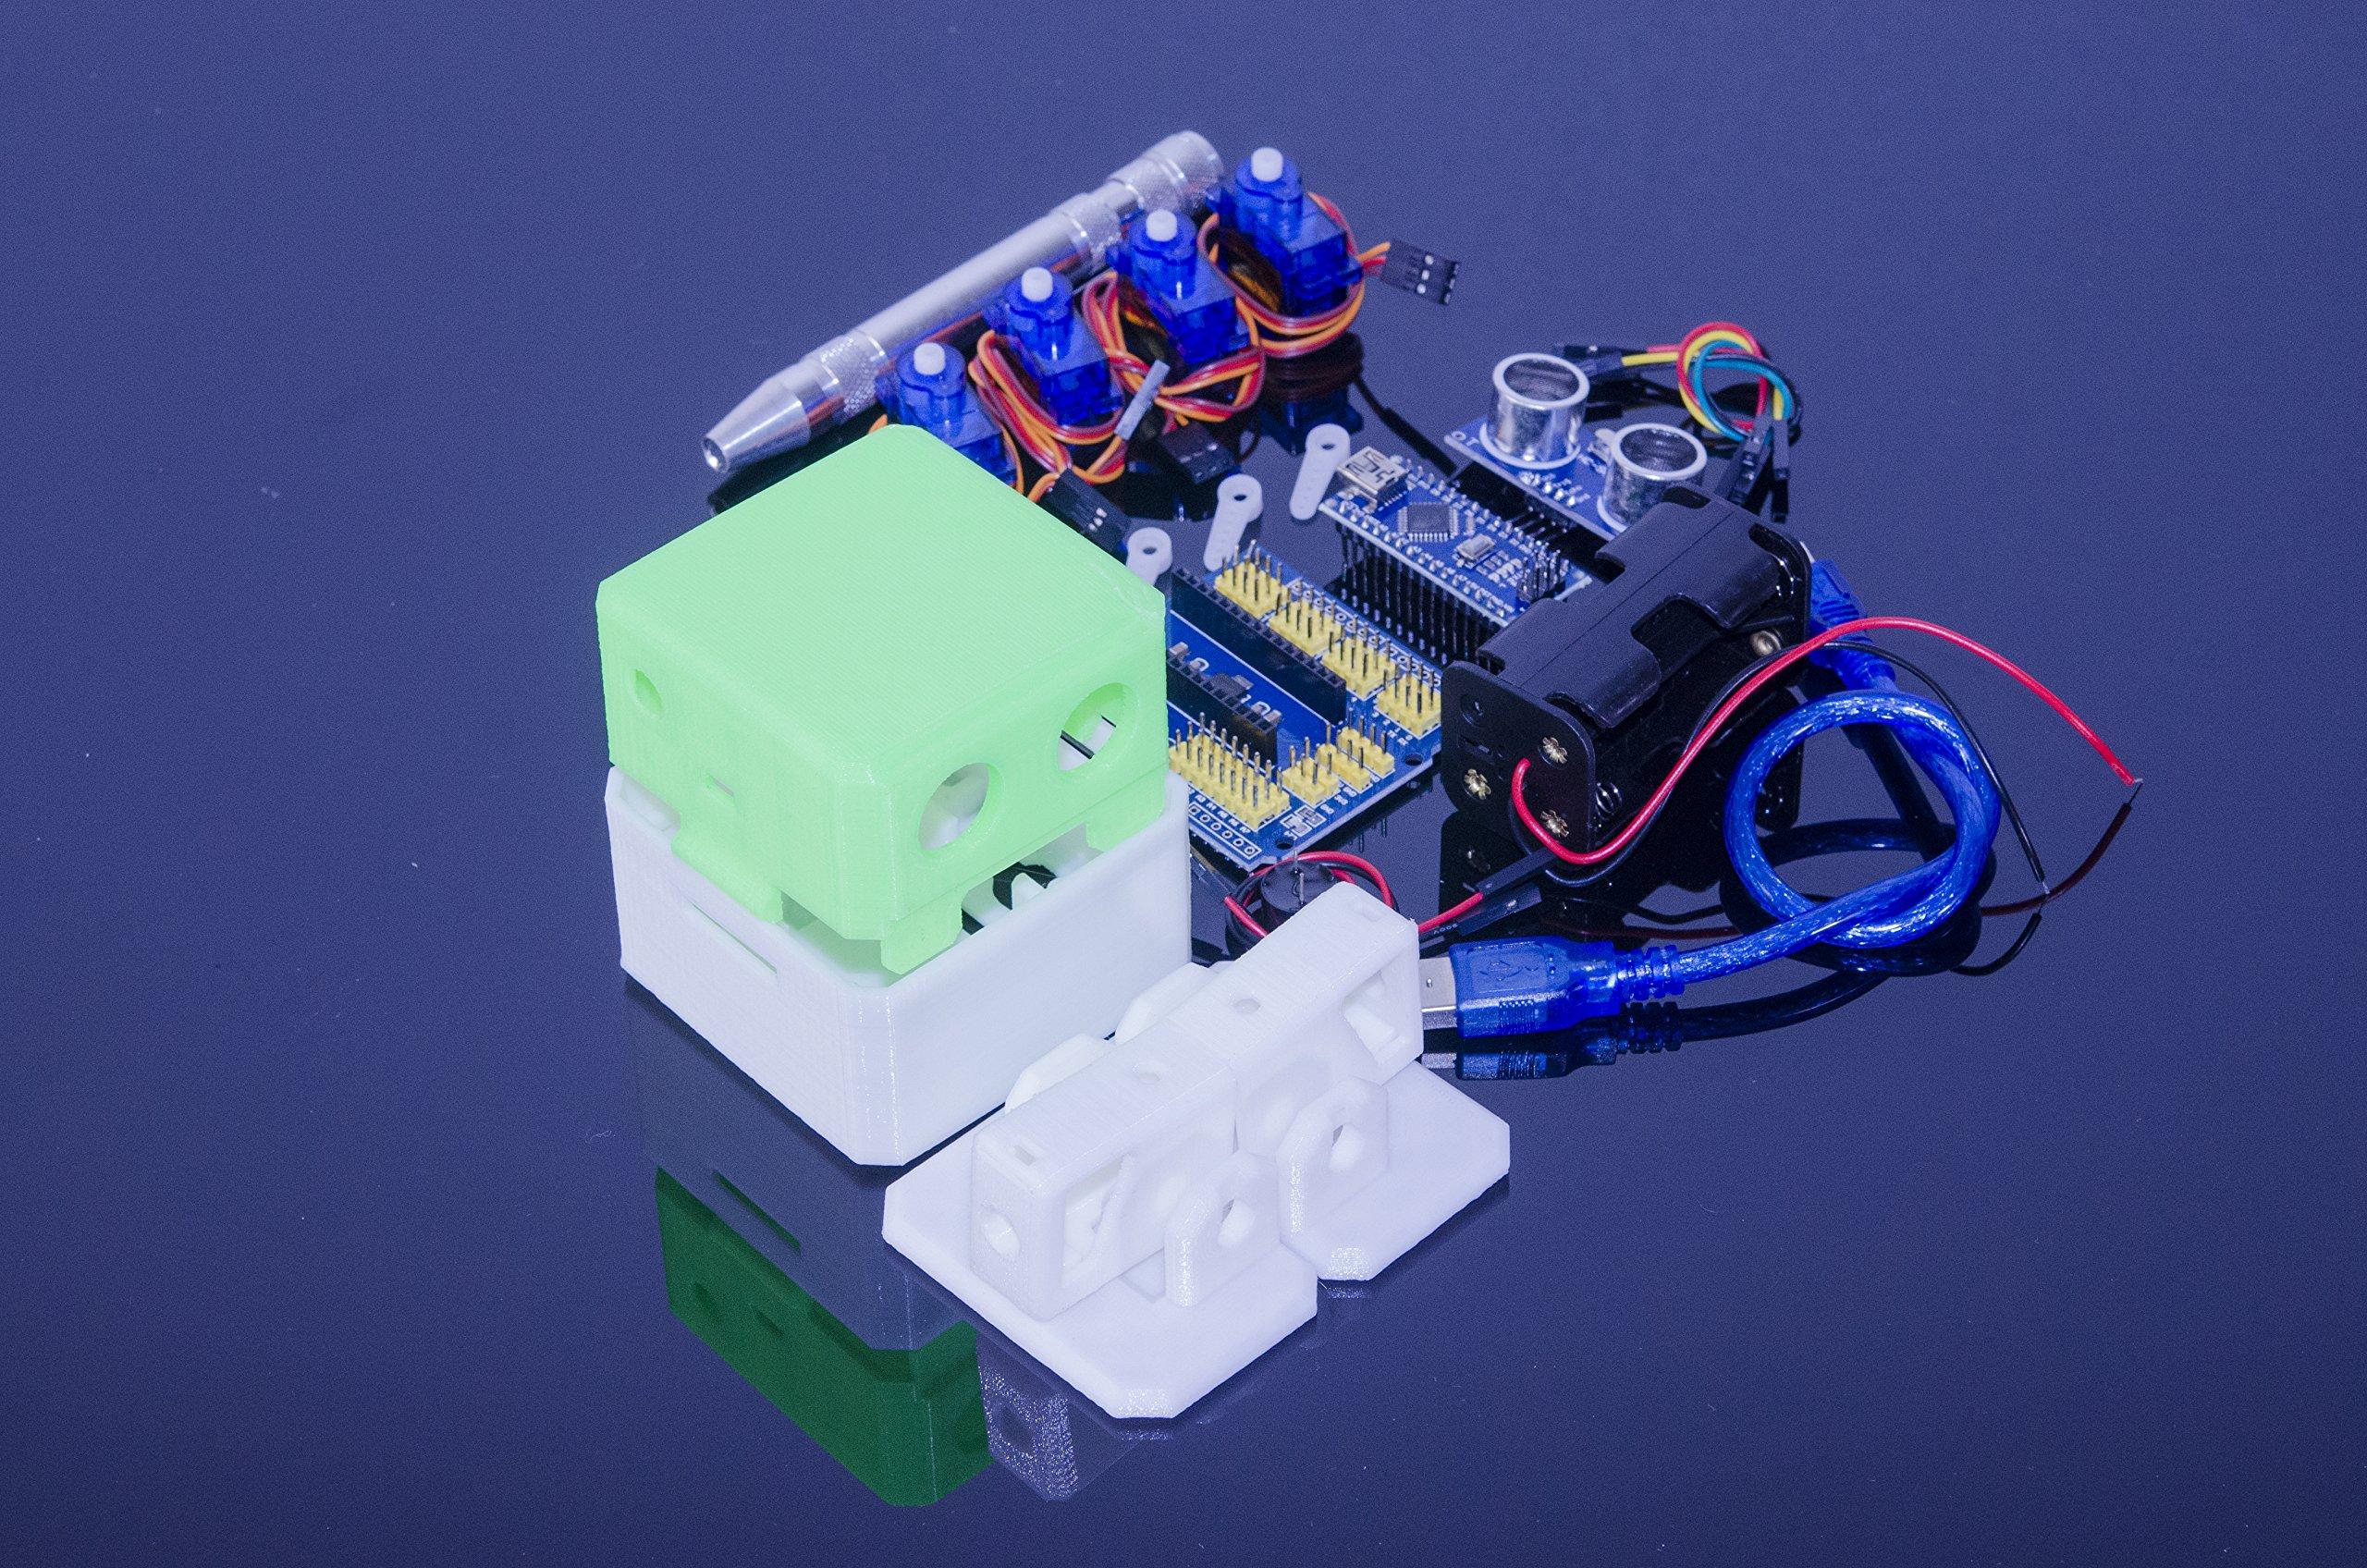 ACROBOTIC Otto Walking Robot Arduino-Compatible Full Kit | Build-It-Yourself Science Kit, Raspberry Pi, ESP8266